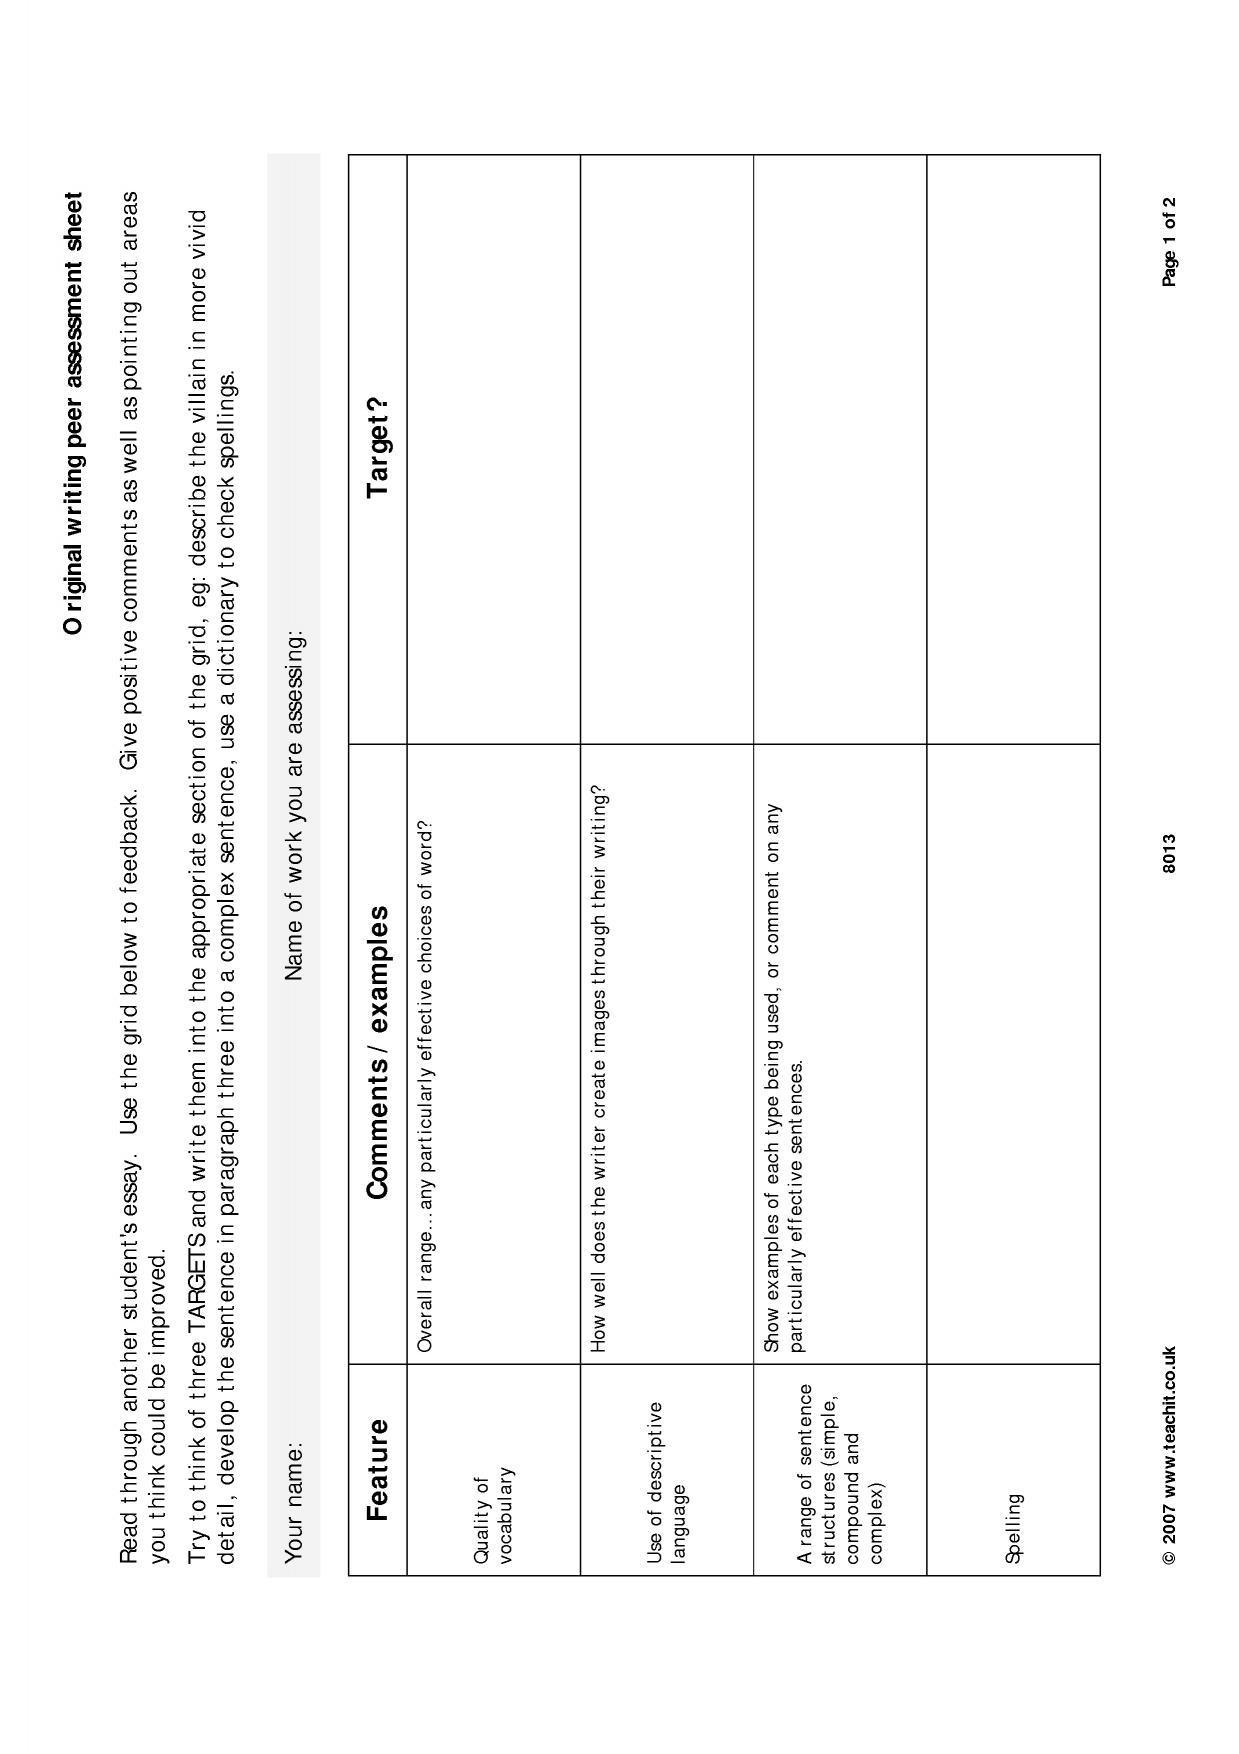 Coursework moderation tools